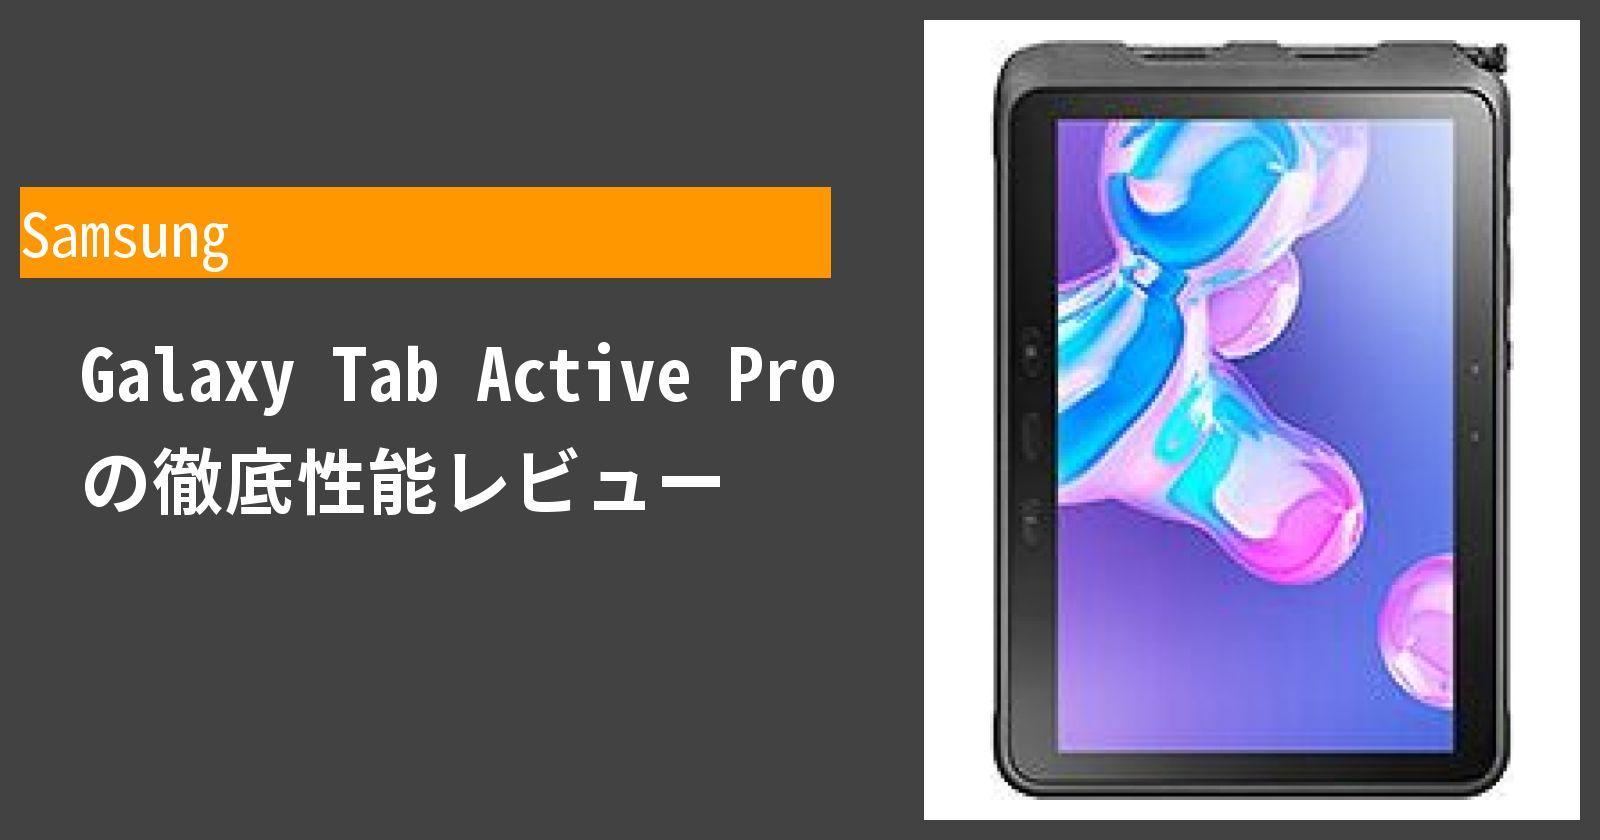 Galaxy Tab Active Pro の徹底性能レビュー